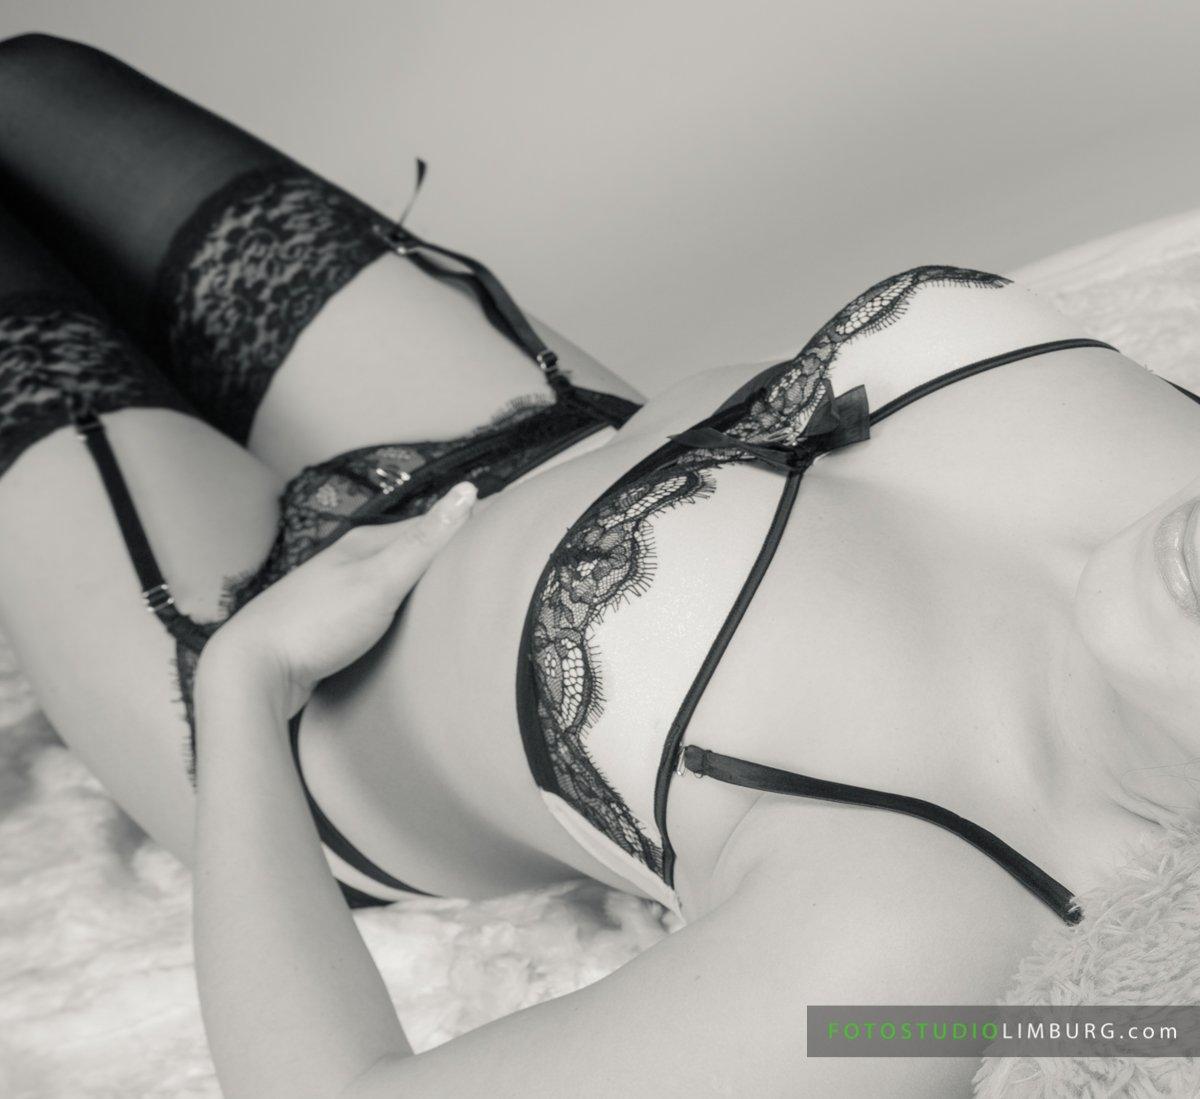 Lingerie-fotoshoot-fotostudio-limburg-03